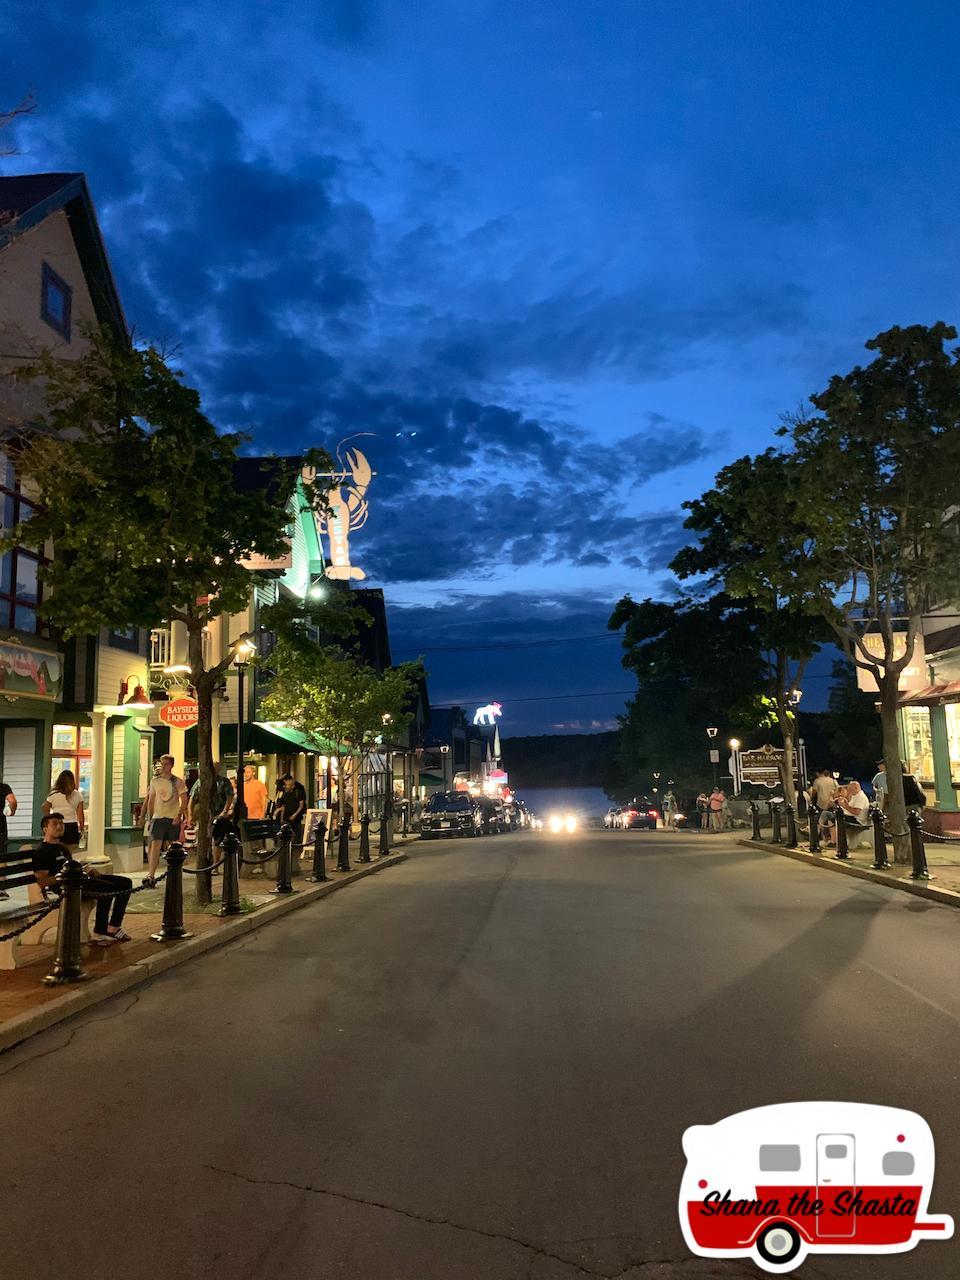 Downtown-Bar-Harbor-at-Sunset